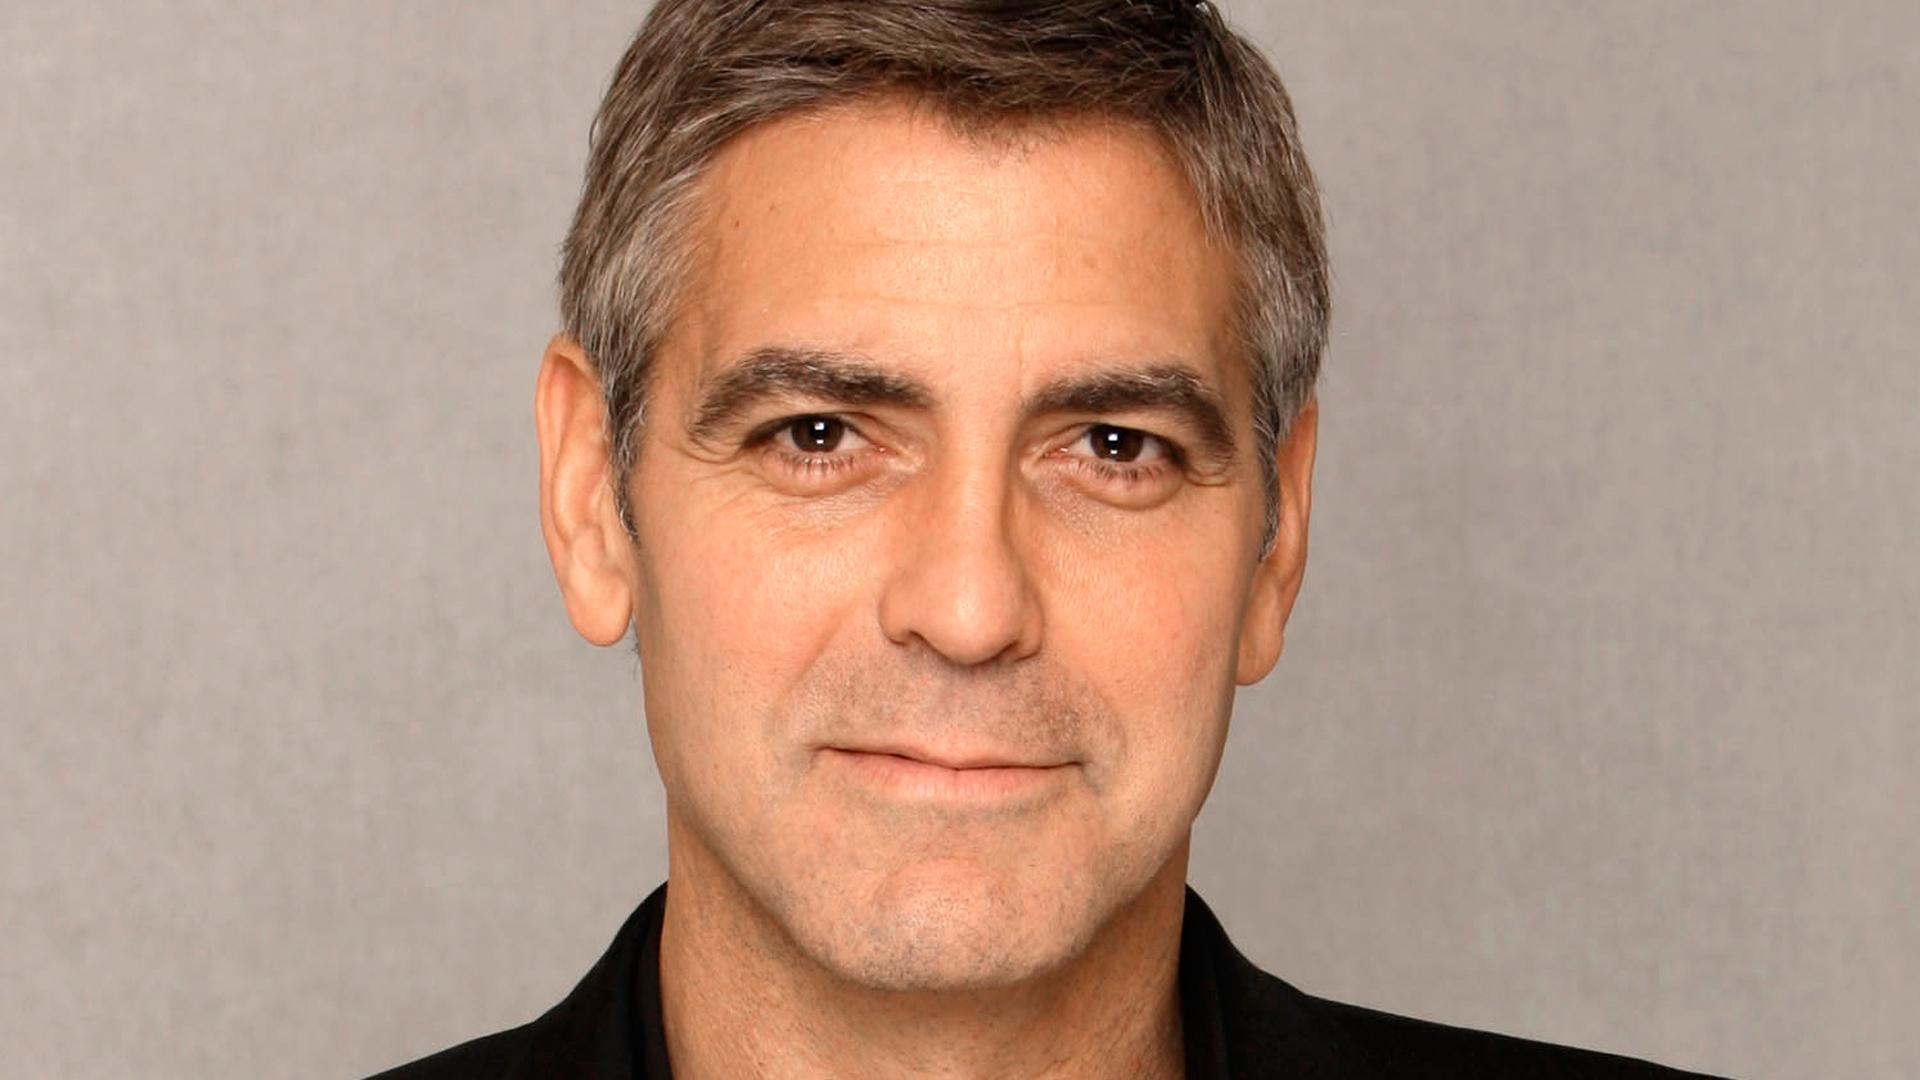 20 Best HD George Clooney Wallpapers feelgrPH 1920x1080